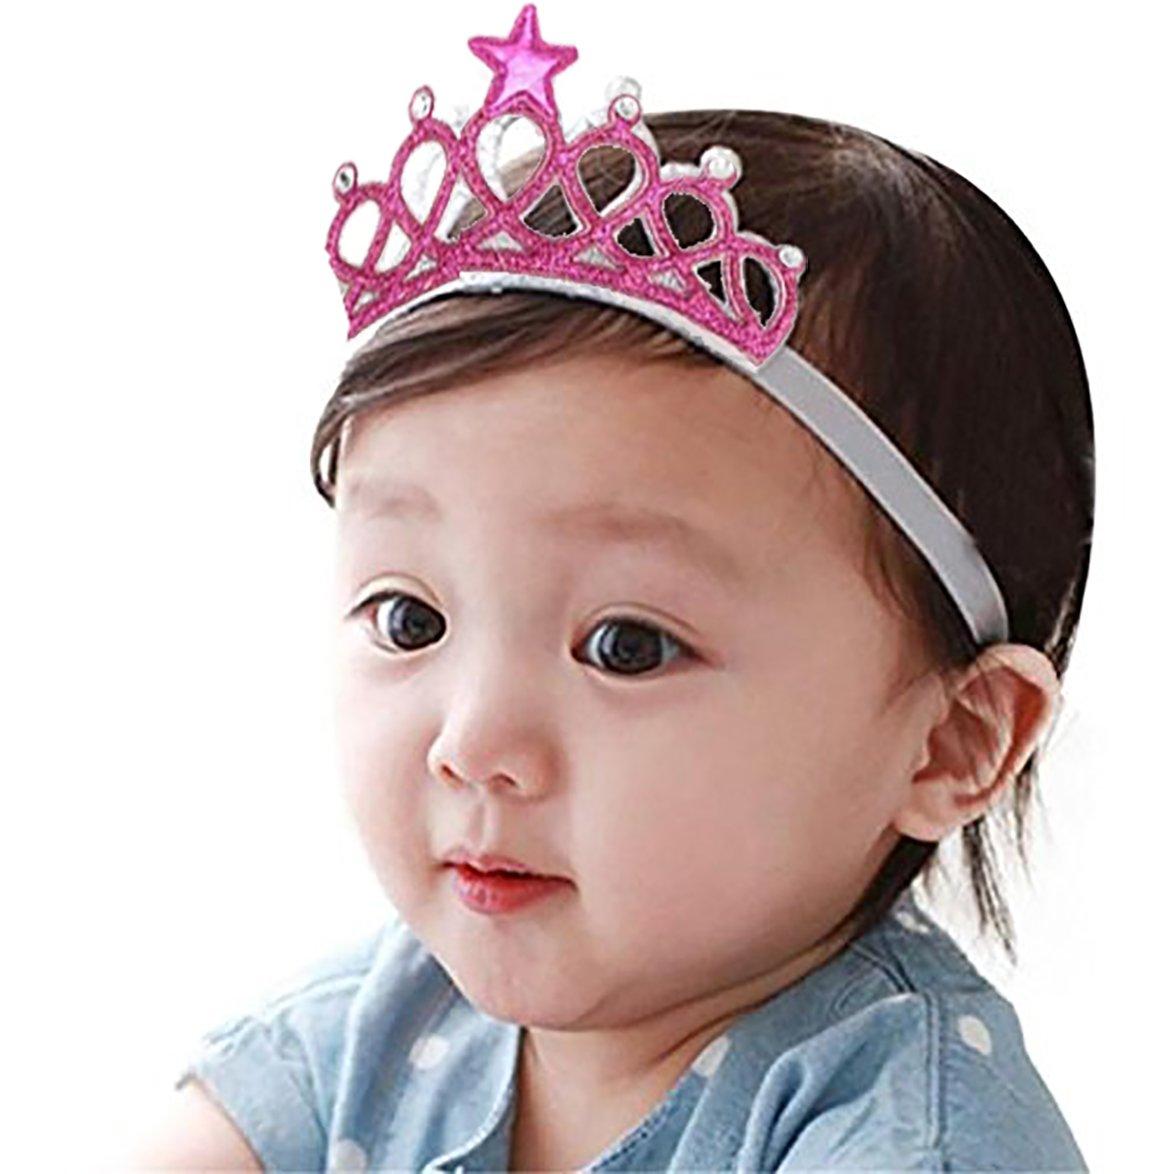 Ziory Pink Baby Girl Baby Boy Unisex Rhinestone Crown Headbands Toddler  Princess Headband Hair Accessories Birthday Gift Tiara Crown Headband   Amazon.in  ... 42fb2b90d0e